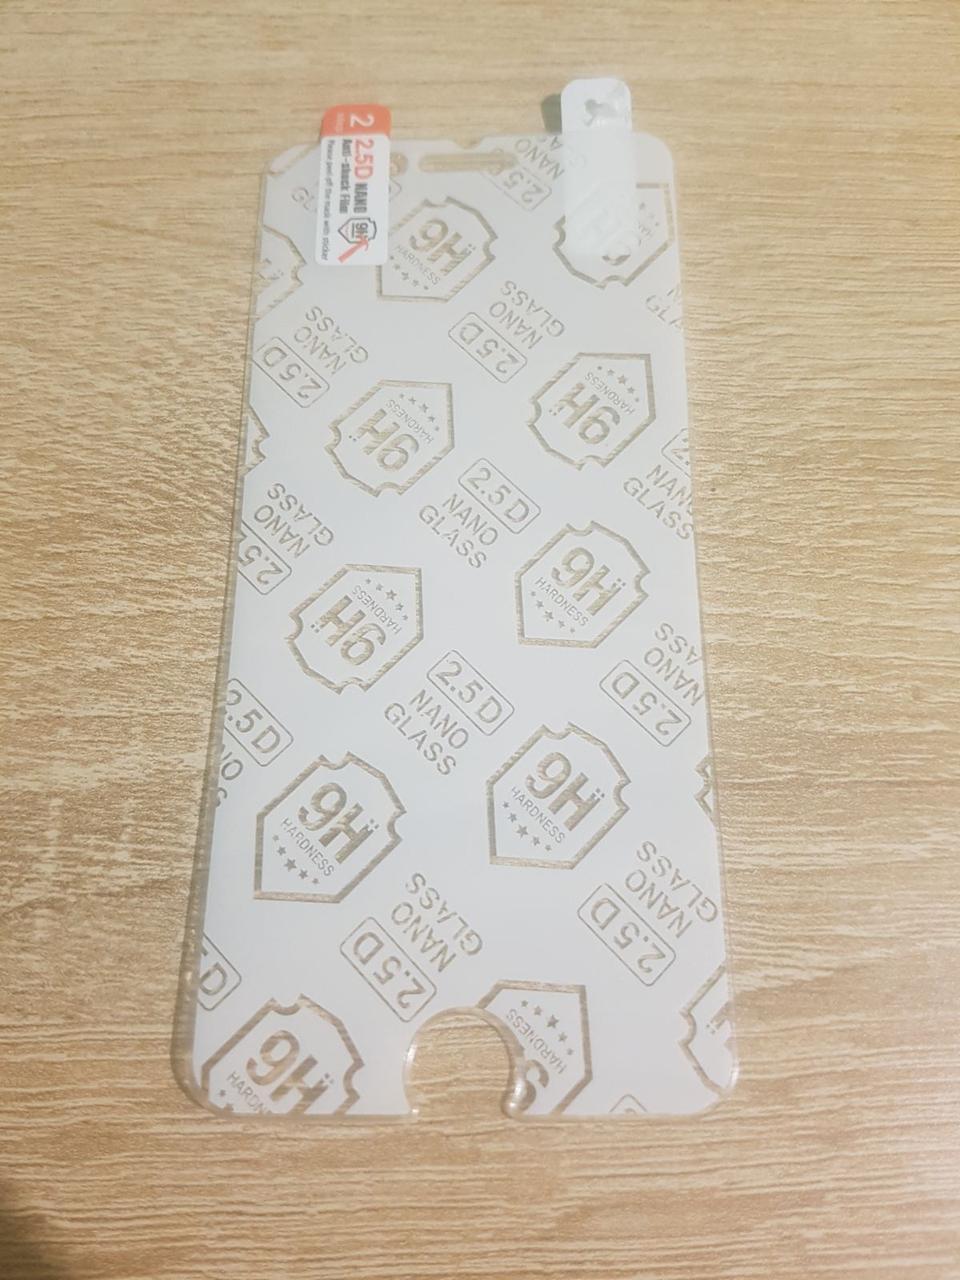 Бронепленка Apple Iphone 7  Iphone7 Iphone8  Iphone 8 клей по всей поверхности